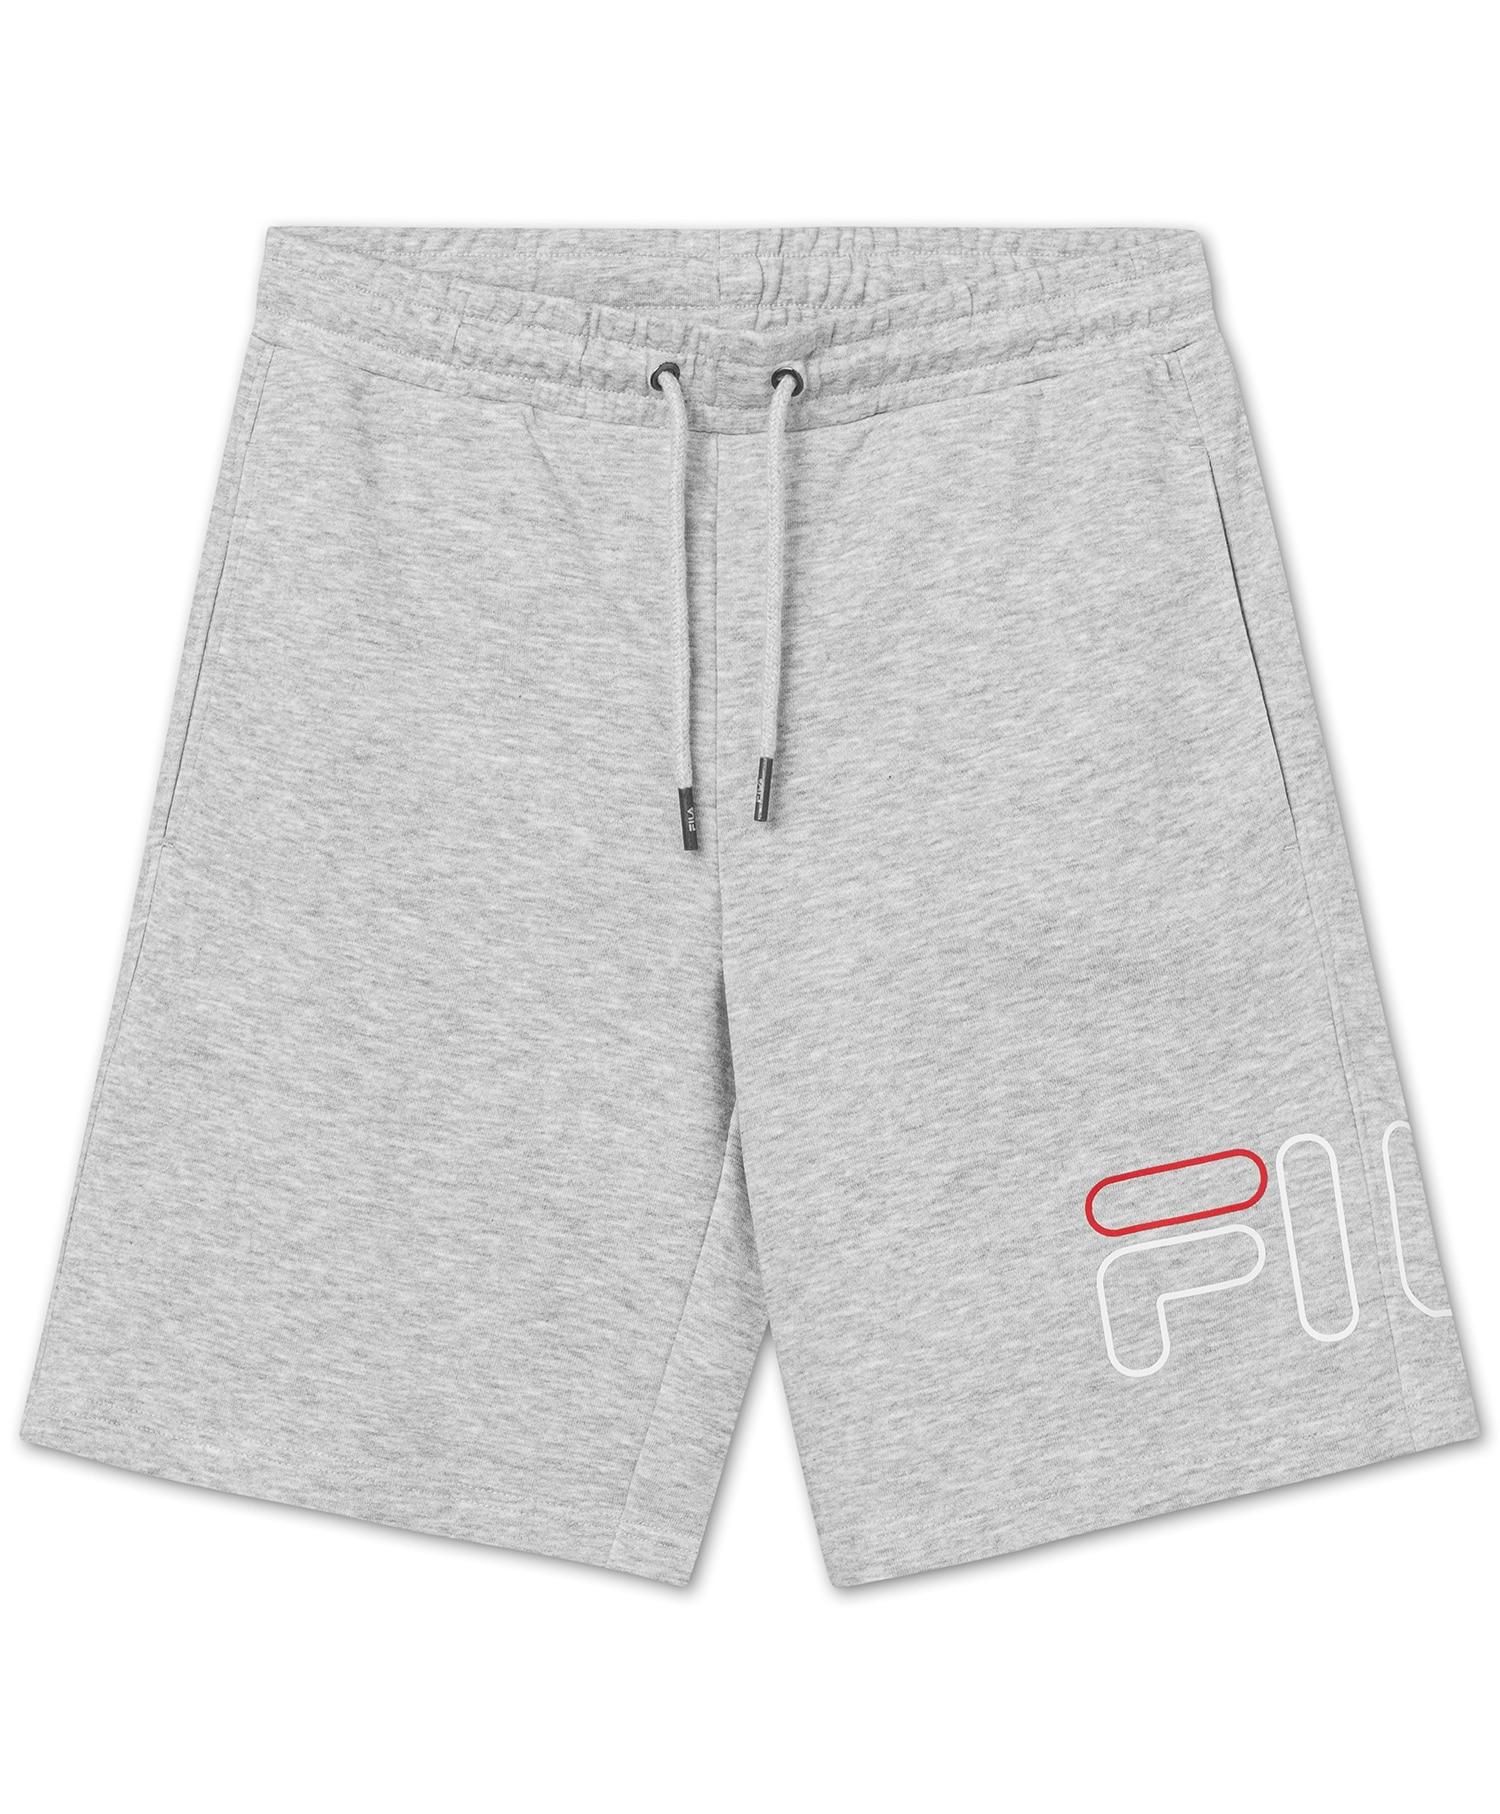 Fila Jared shorts